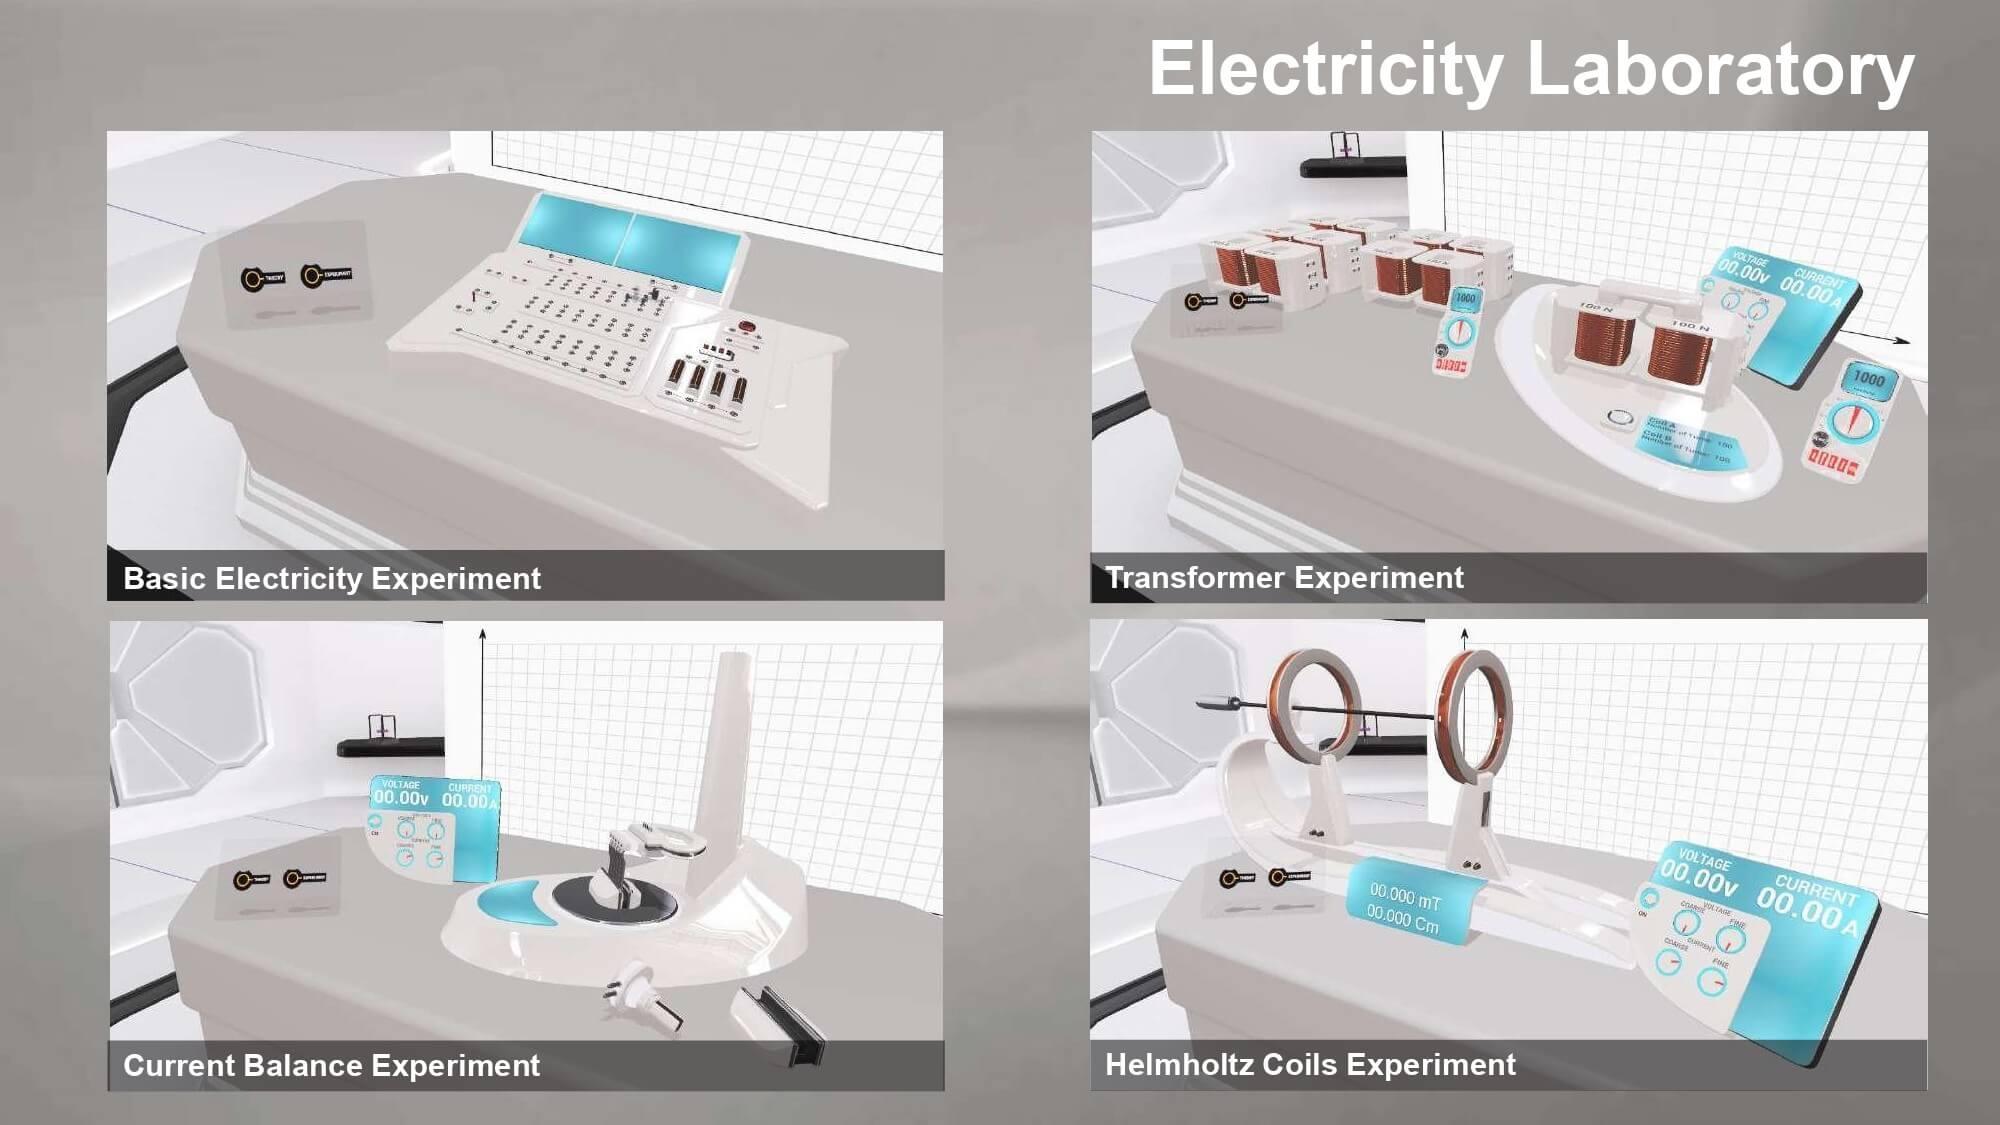 Electric Laboratory